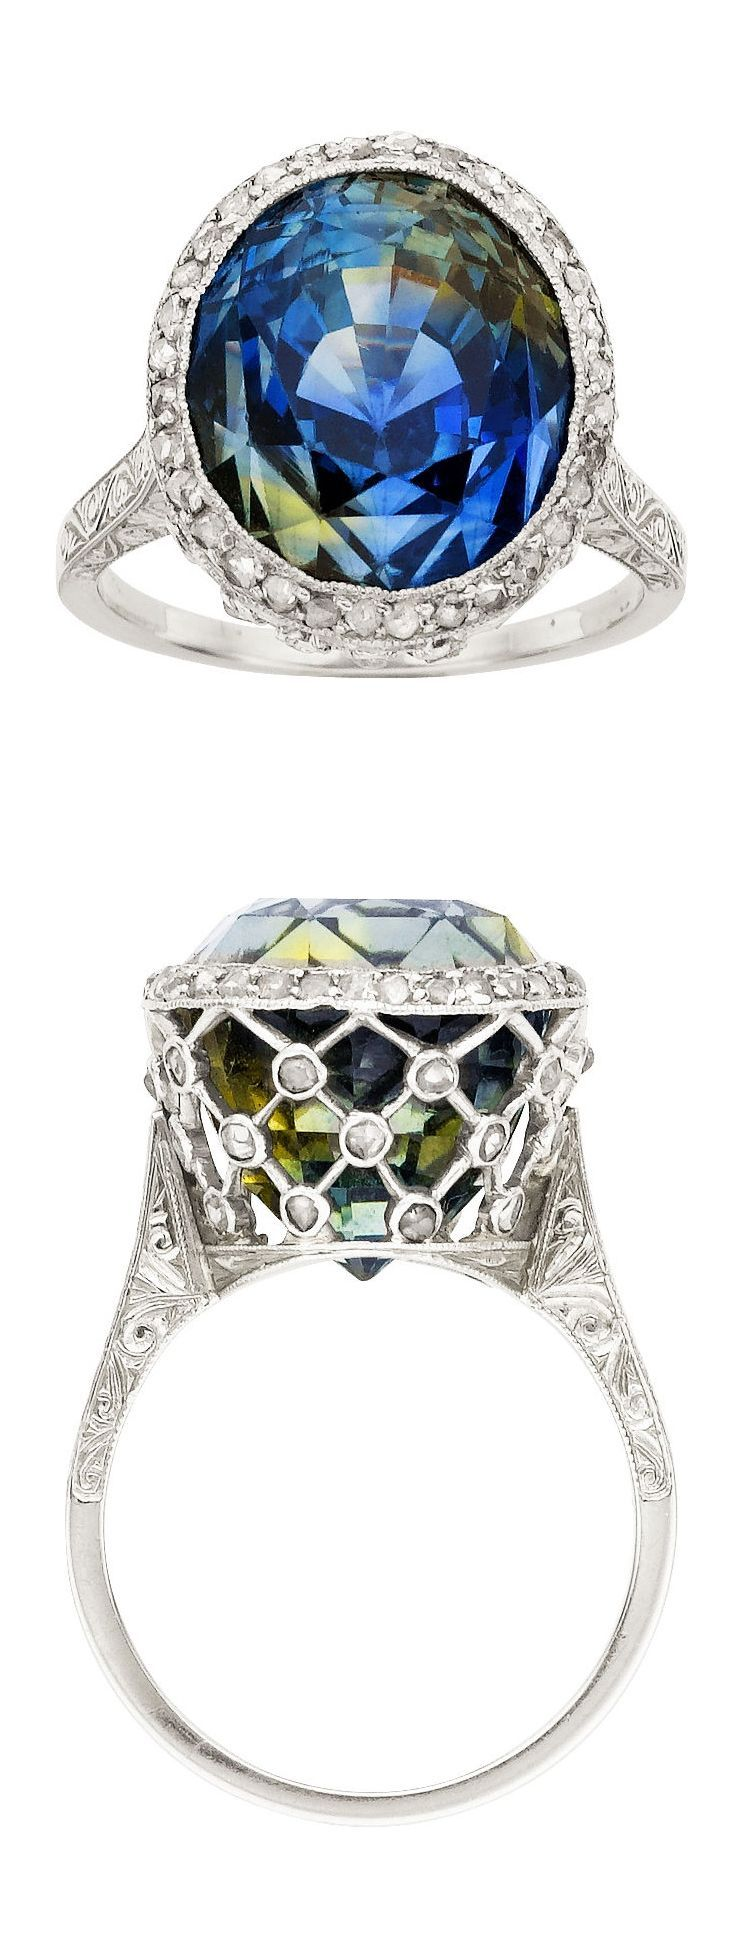 Edwardian Chameleon Sapphire Ring, approximately 15.70 carats